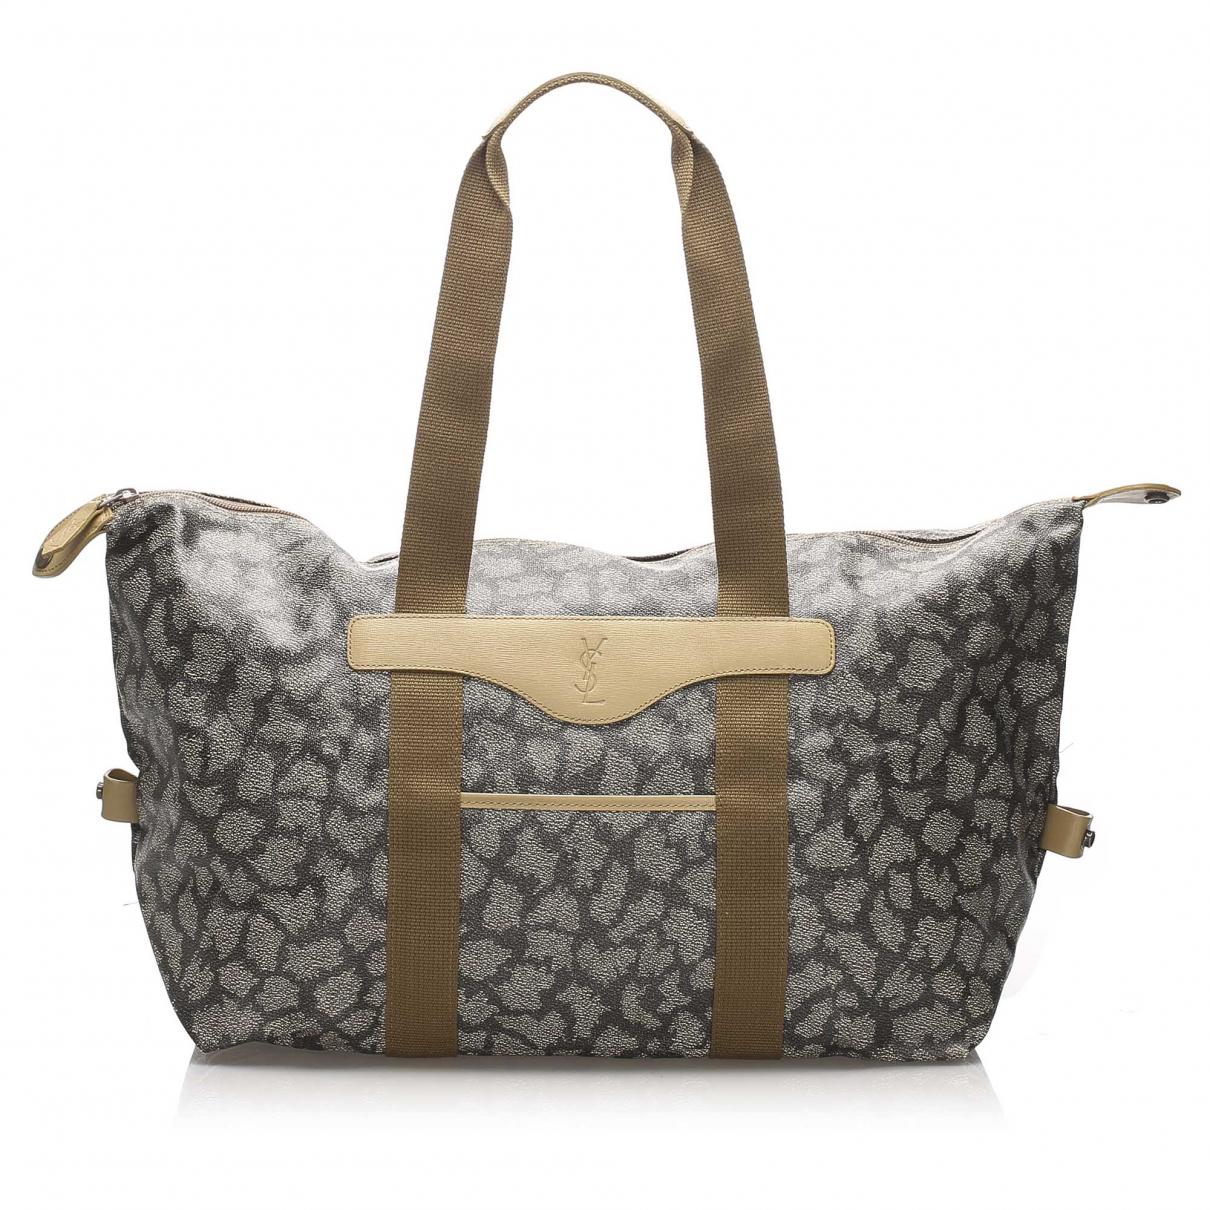 Yves Saint Laurent \N Handtasche in  Grau Leinen